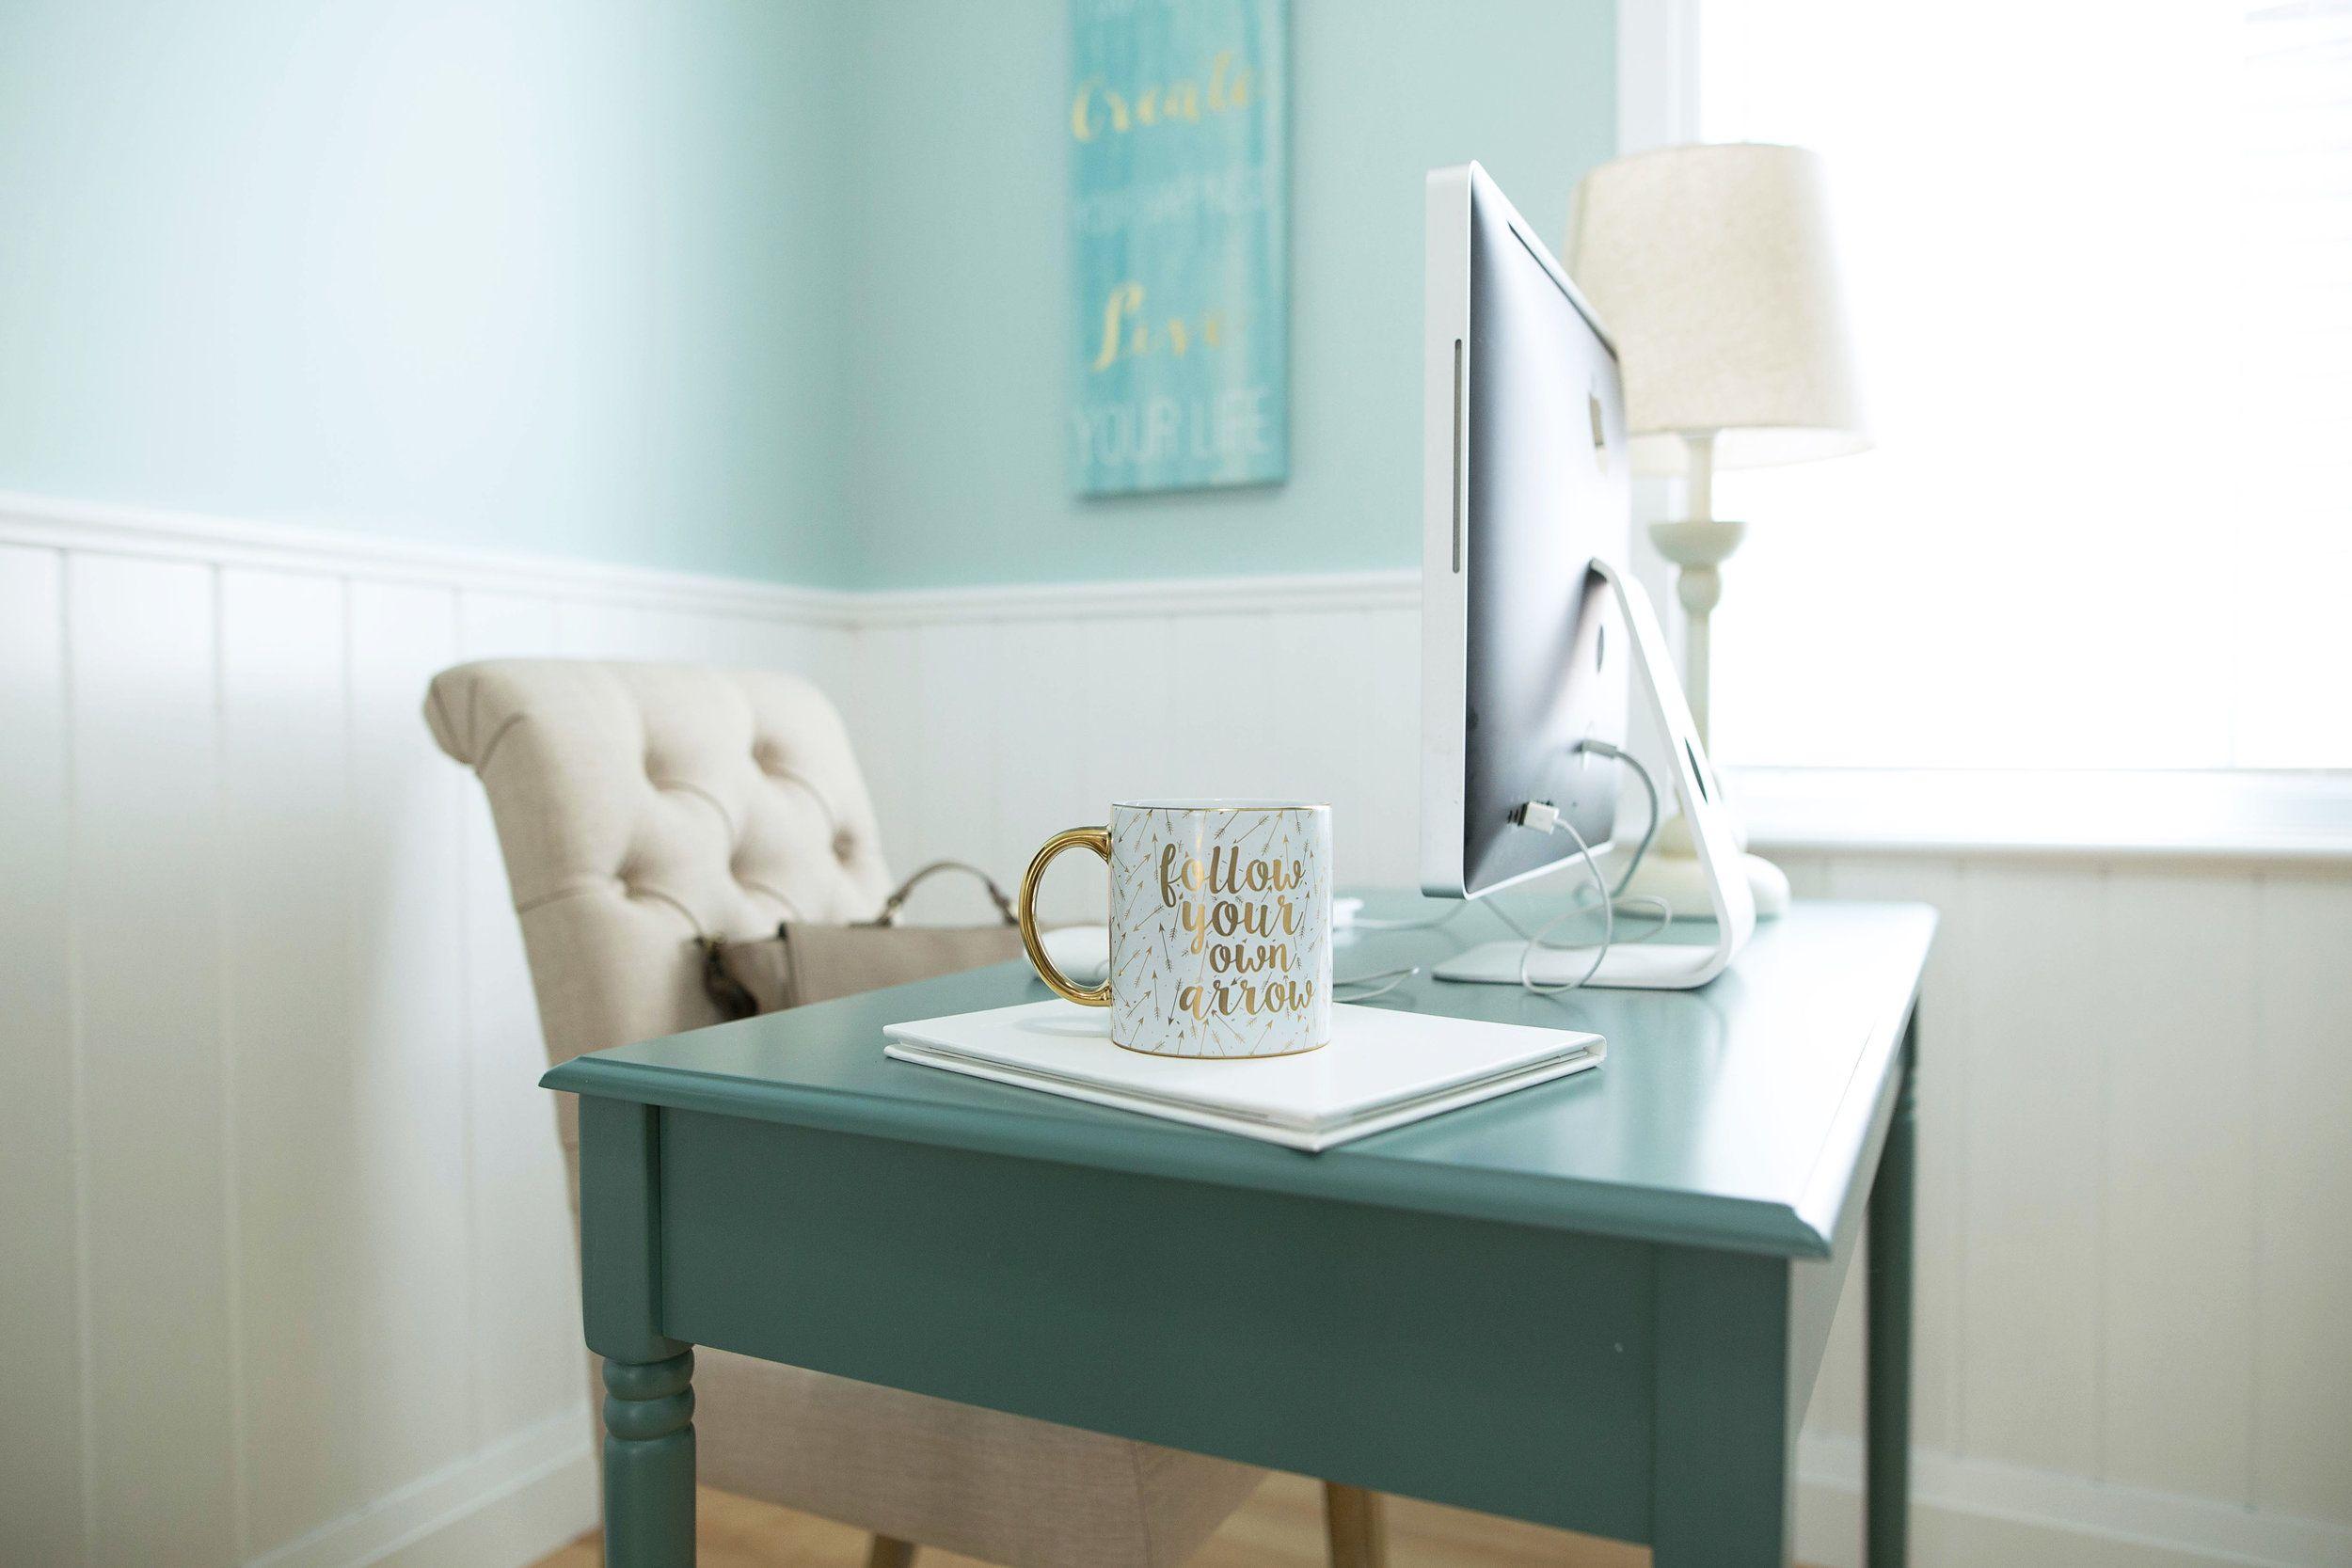 Ma Belle Bureau - A Beautiful New Creative Space for Me & You